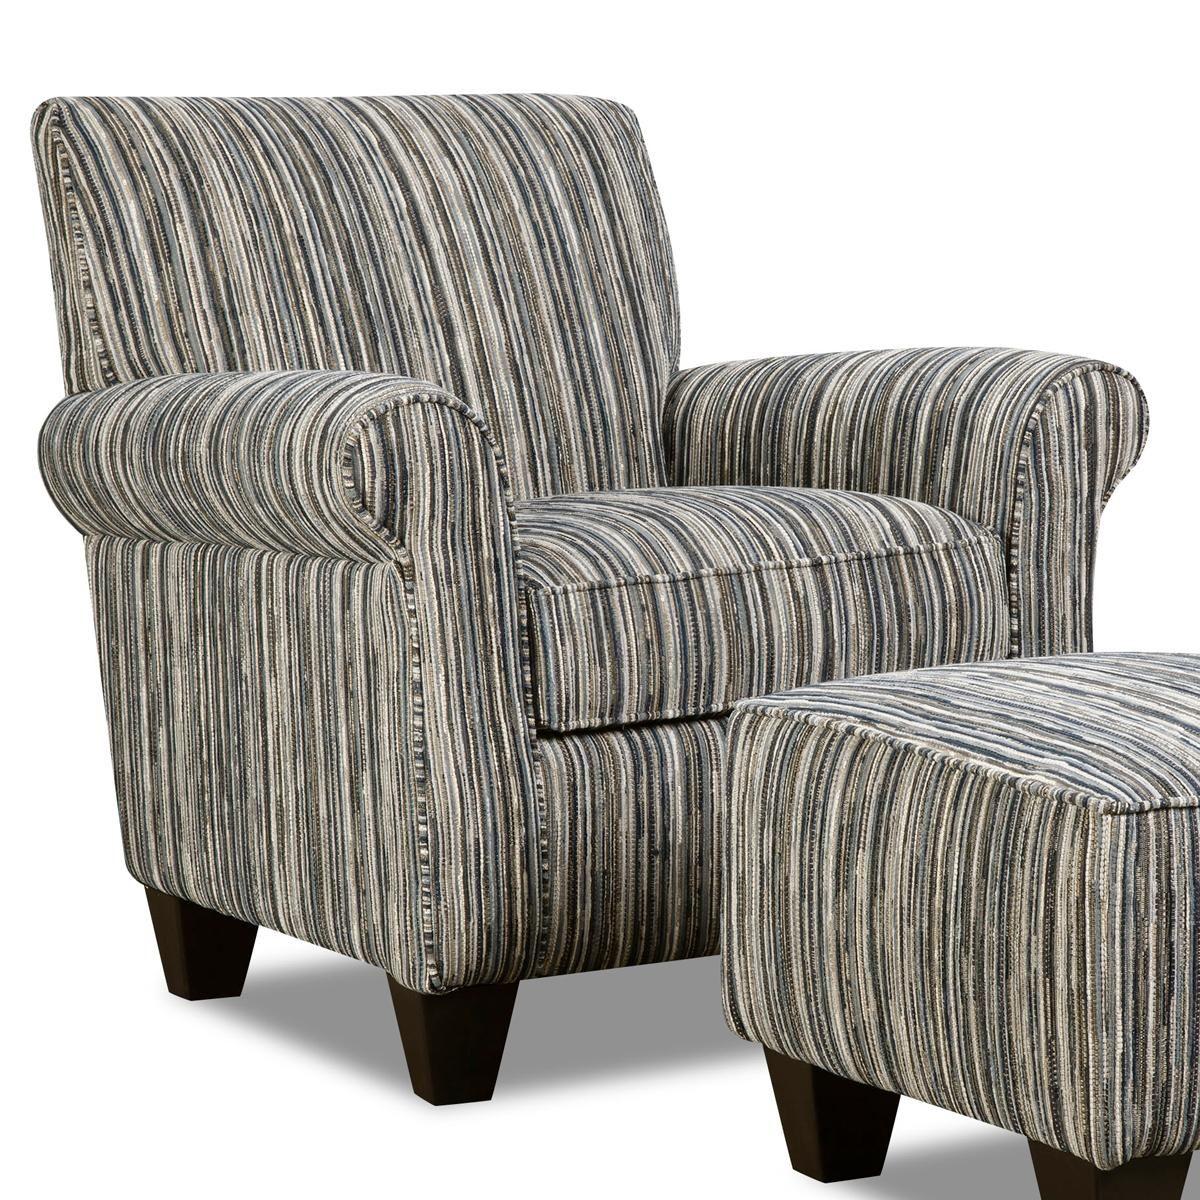 Product Main Image 0 Comfortable Living Room Chairs Furniture Nebraska Furniture Mart